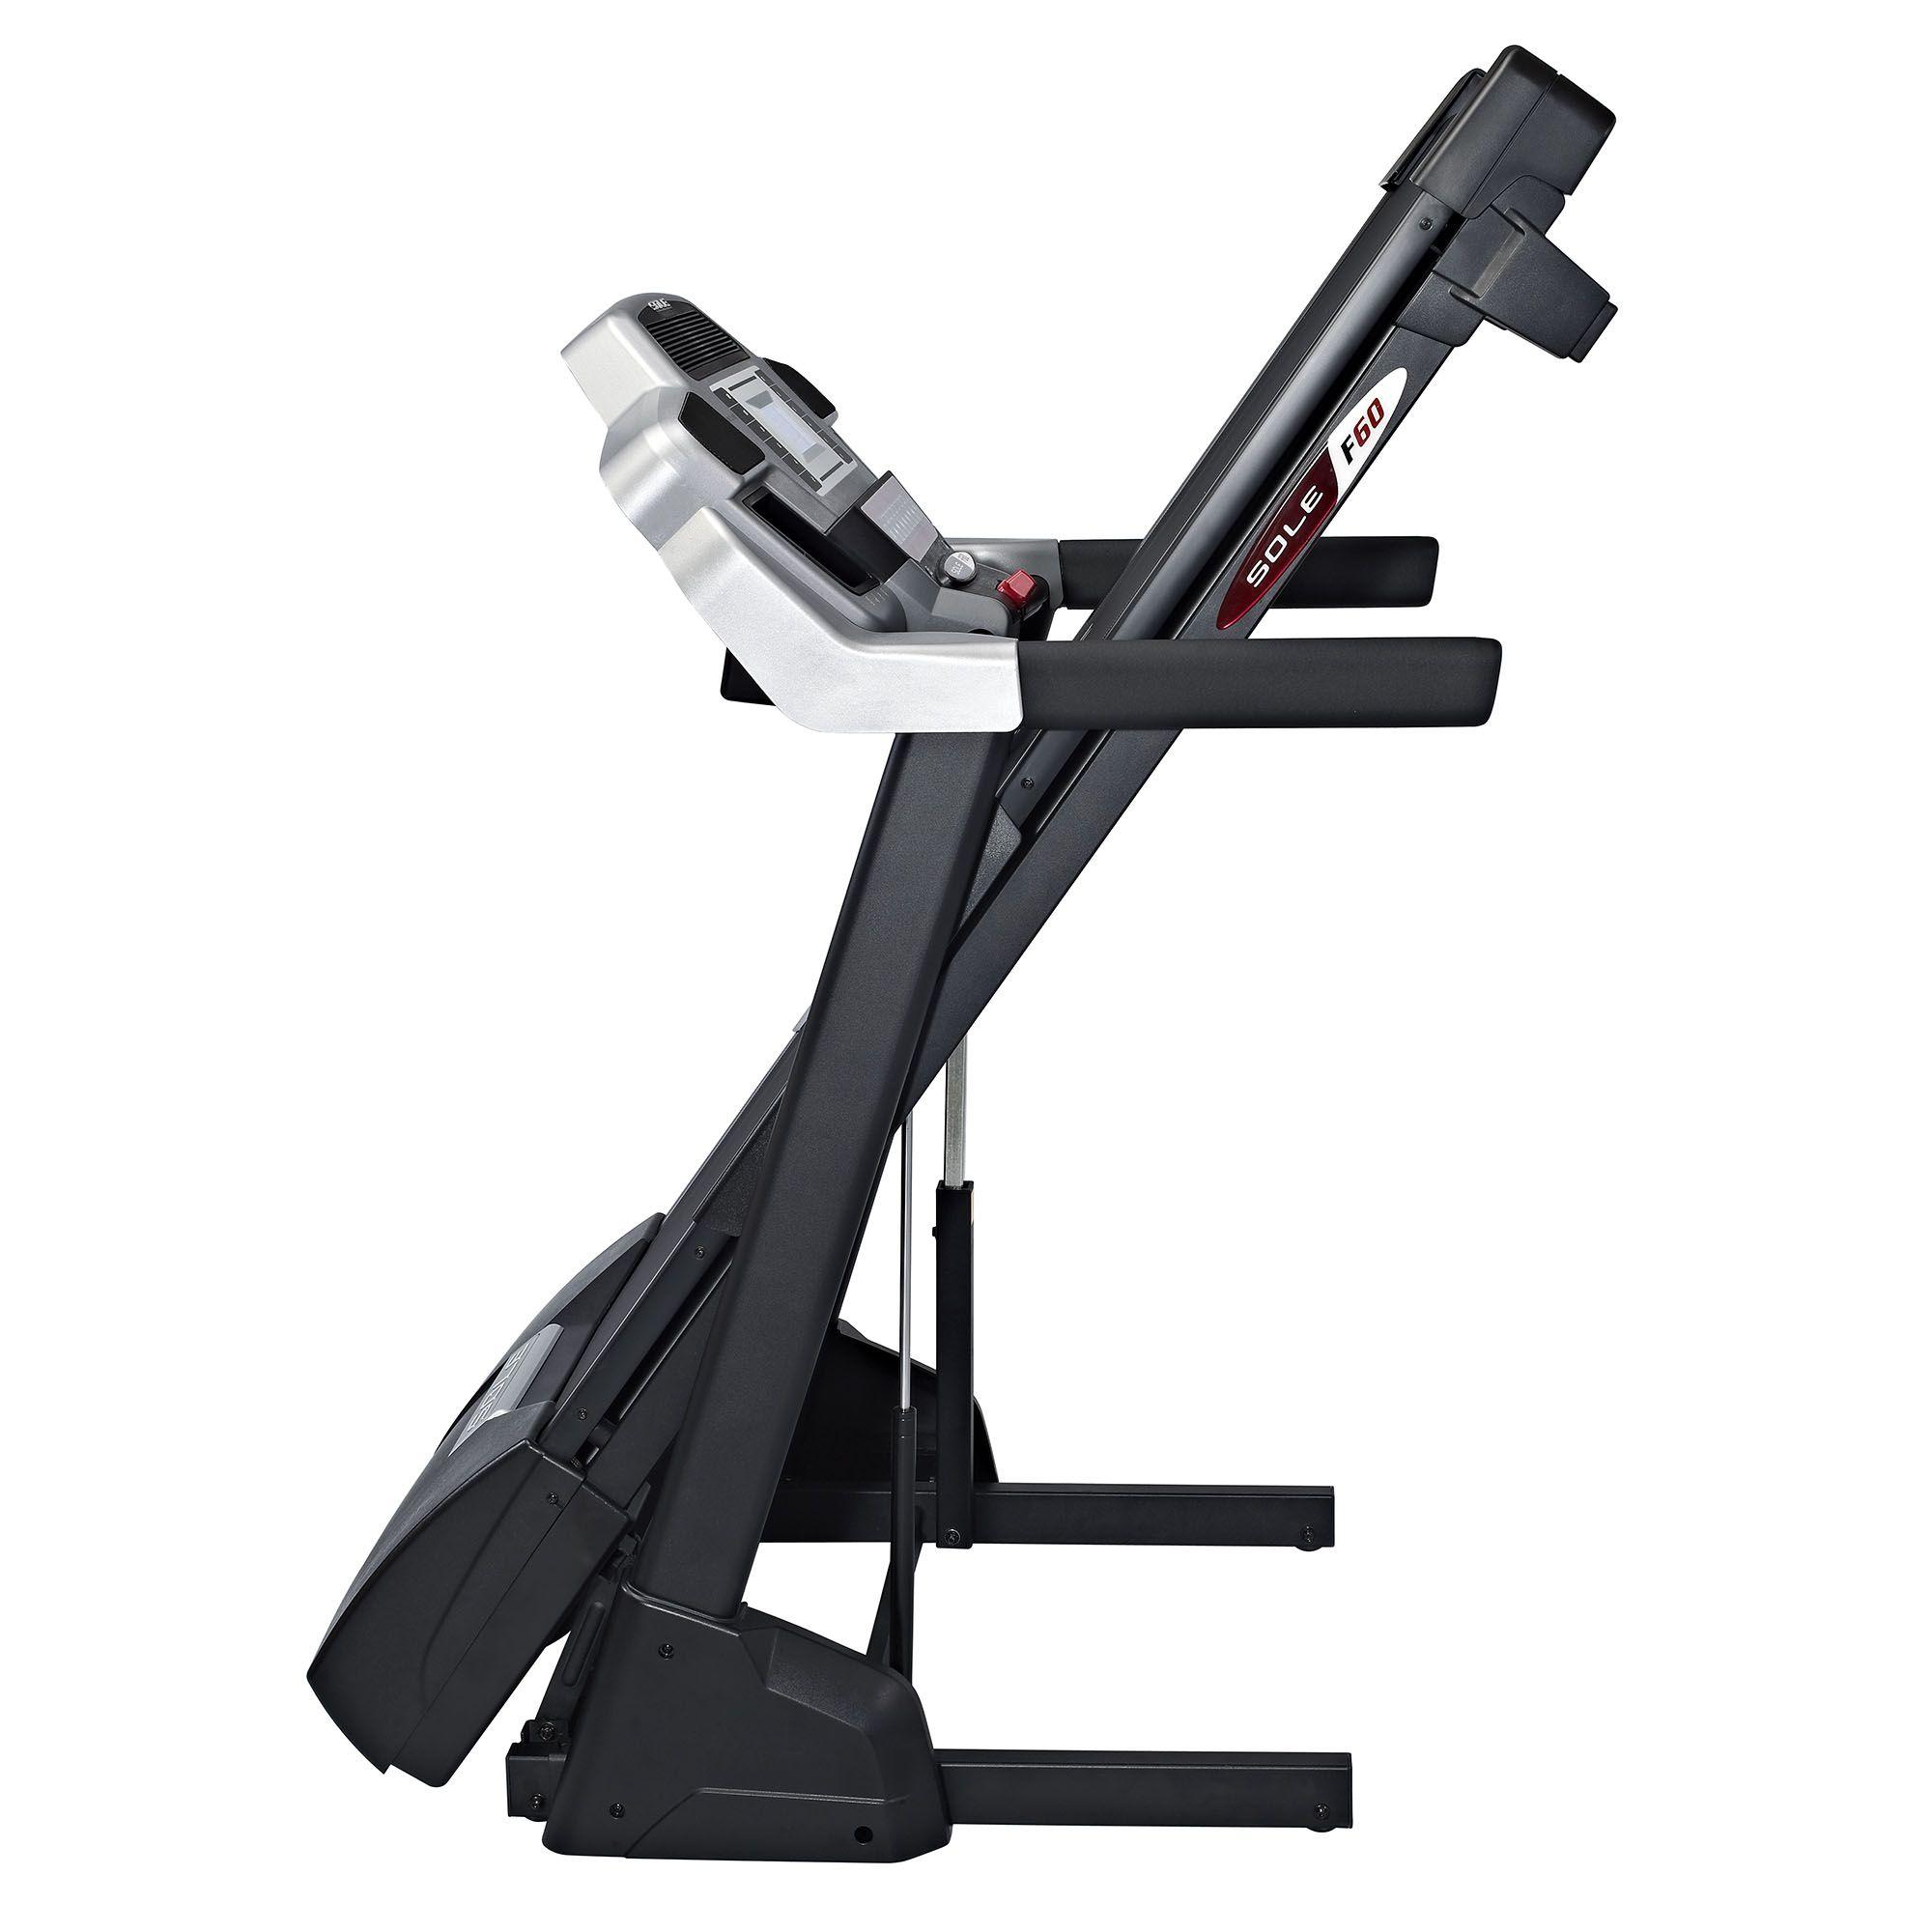 sole f60 treadmill user manual